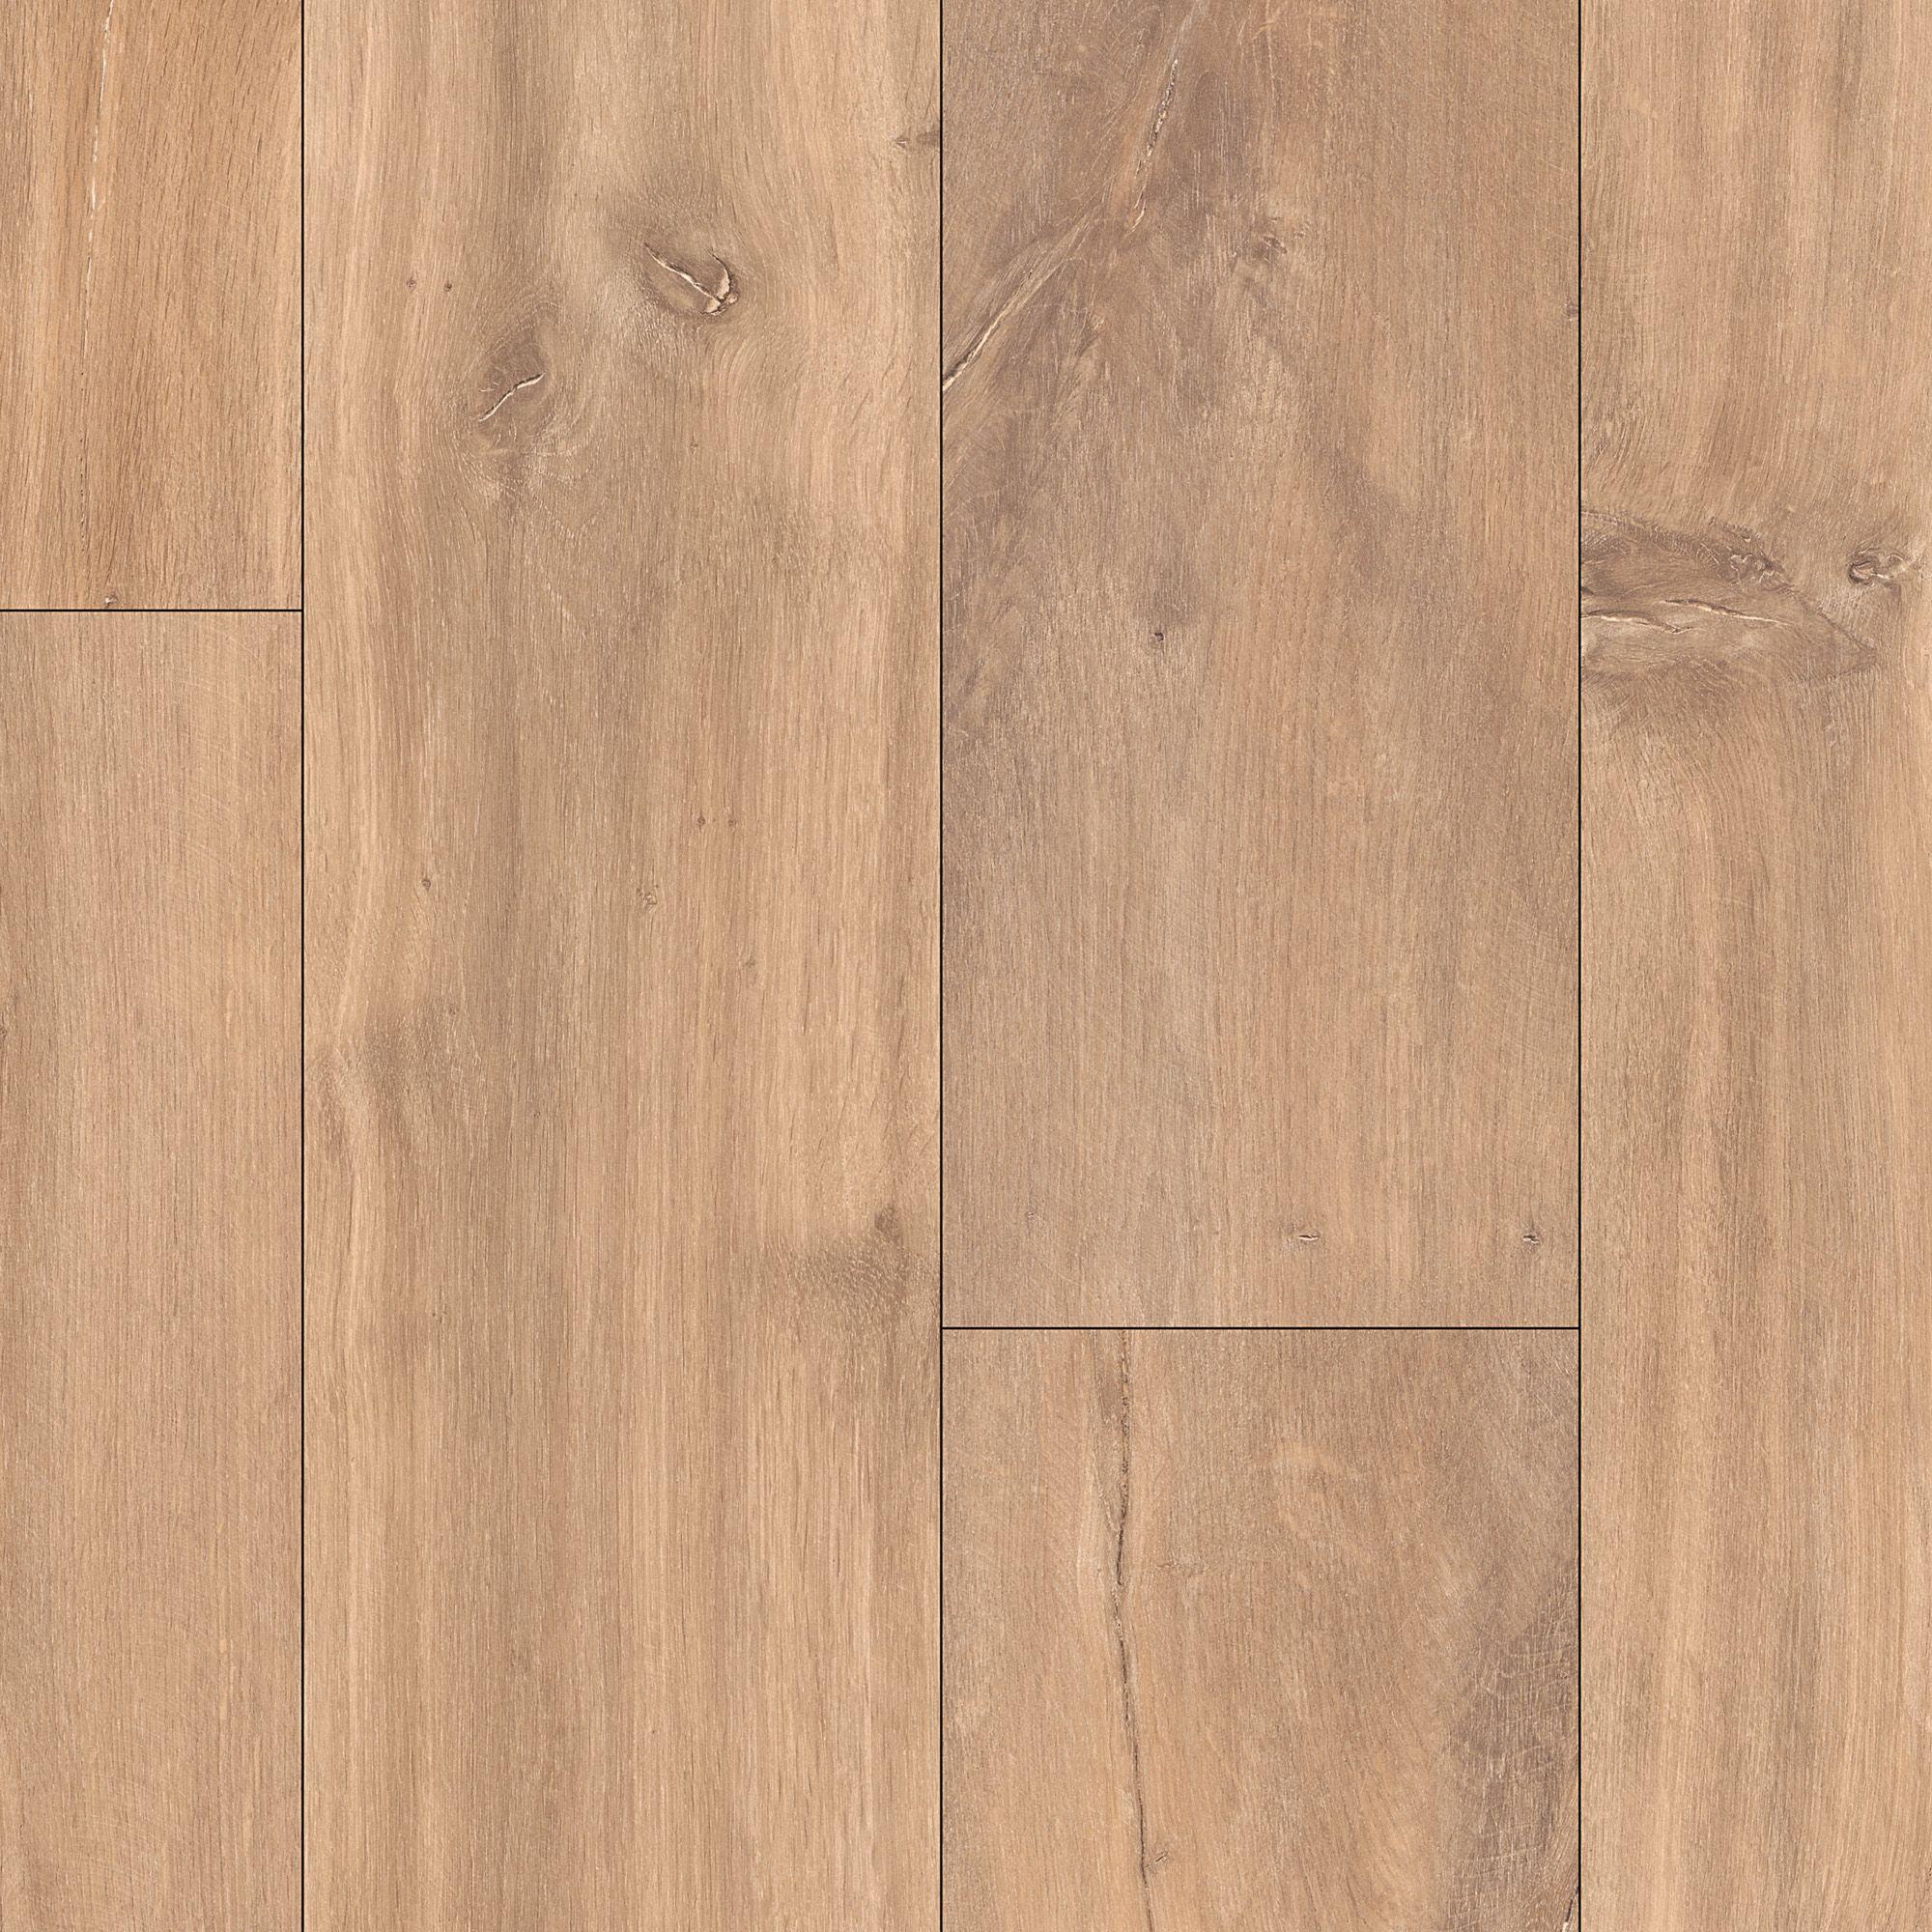 Calando mid natural oak effect laminate flooring sample for B q laminate flooring